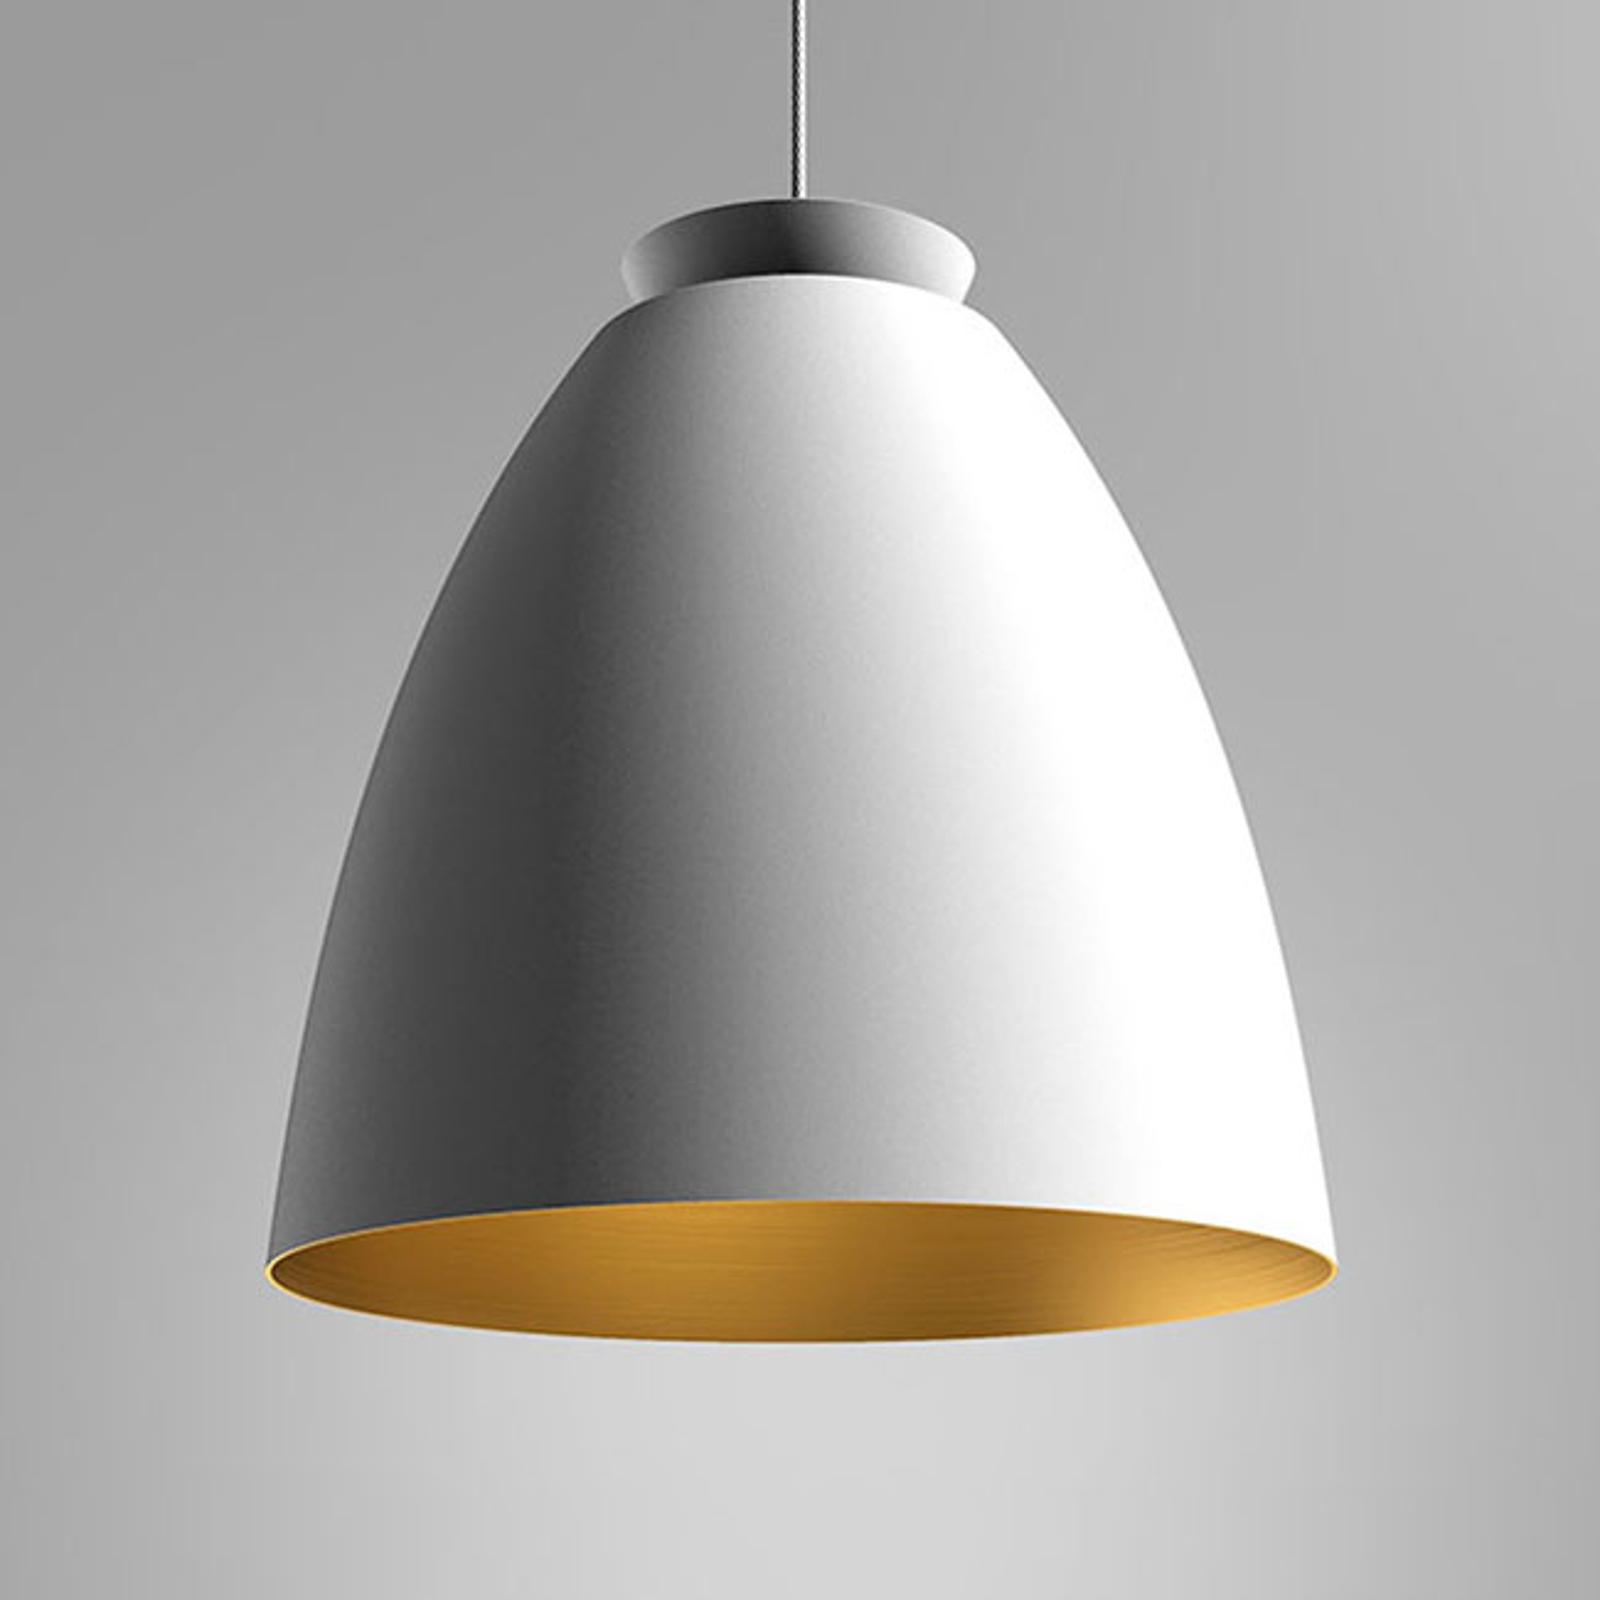 Innermost Chelsea - hanglamp Ø 42cm wit